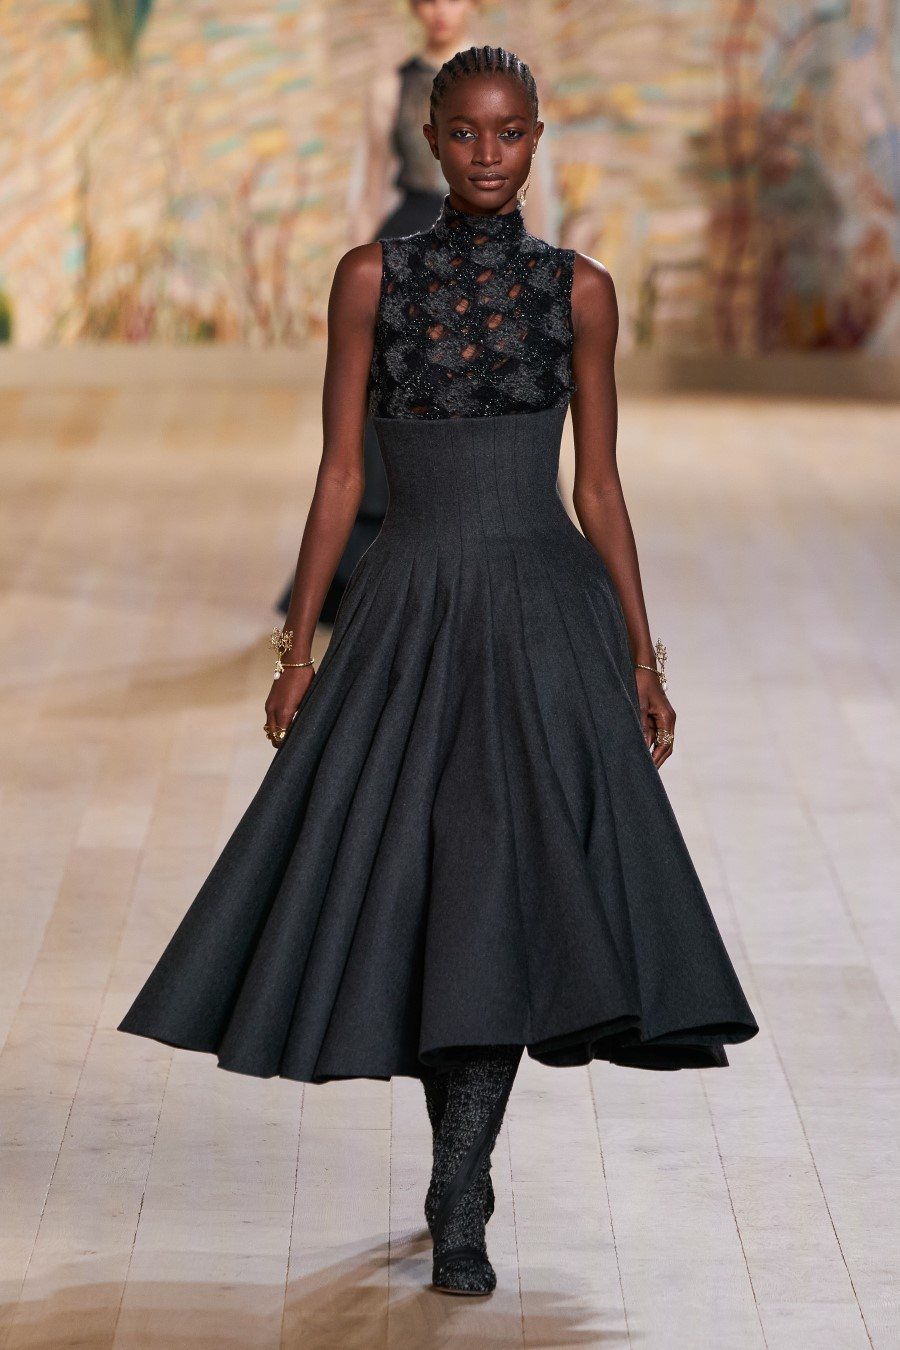 Christian Dior Haute Couture Fall/Winter 2021